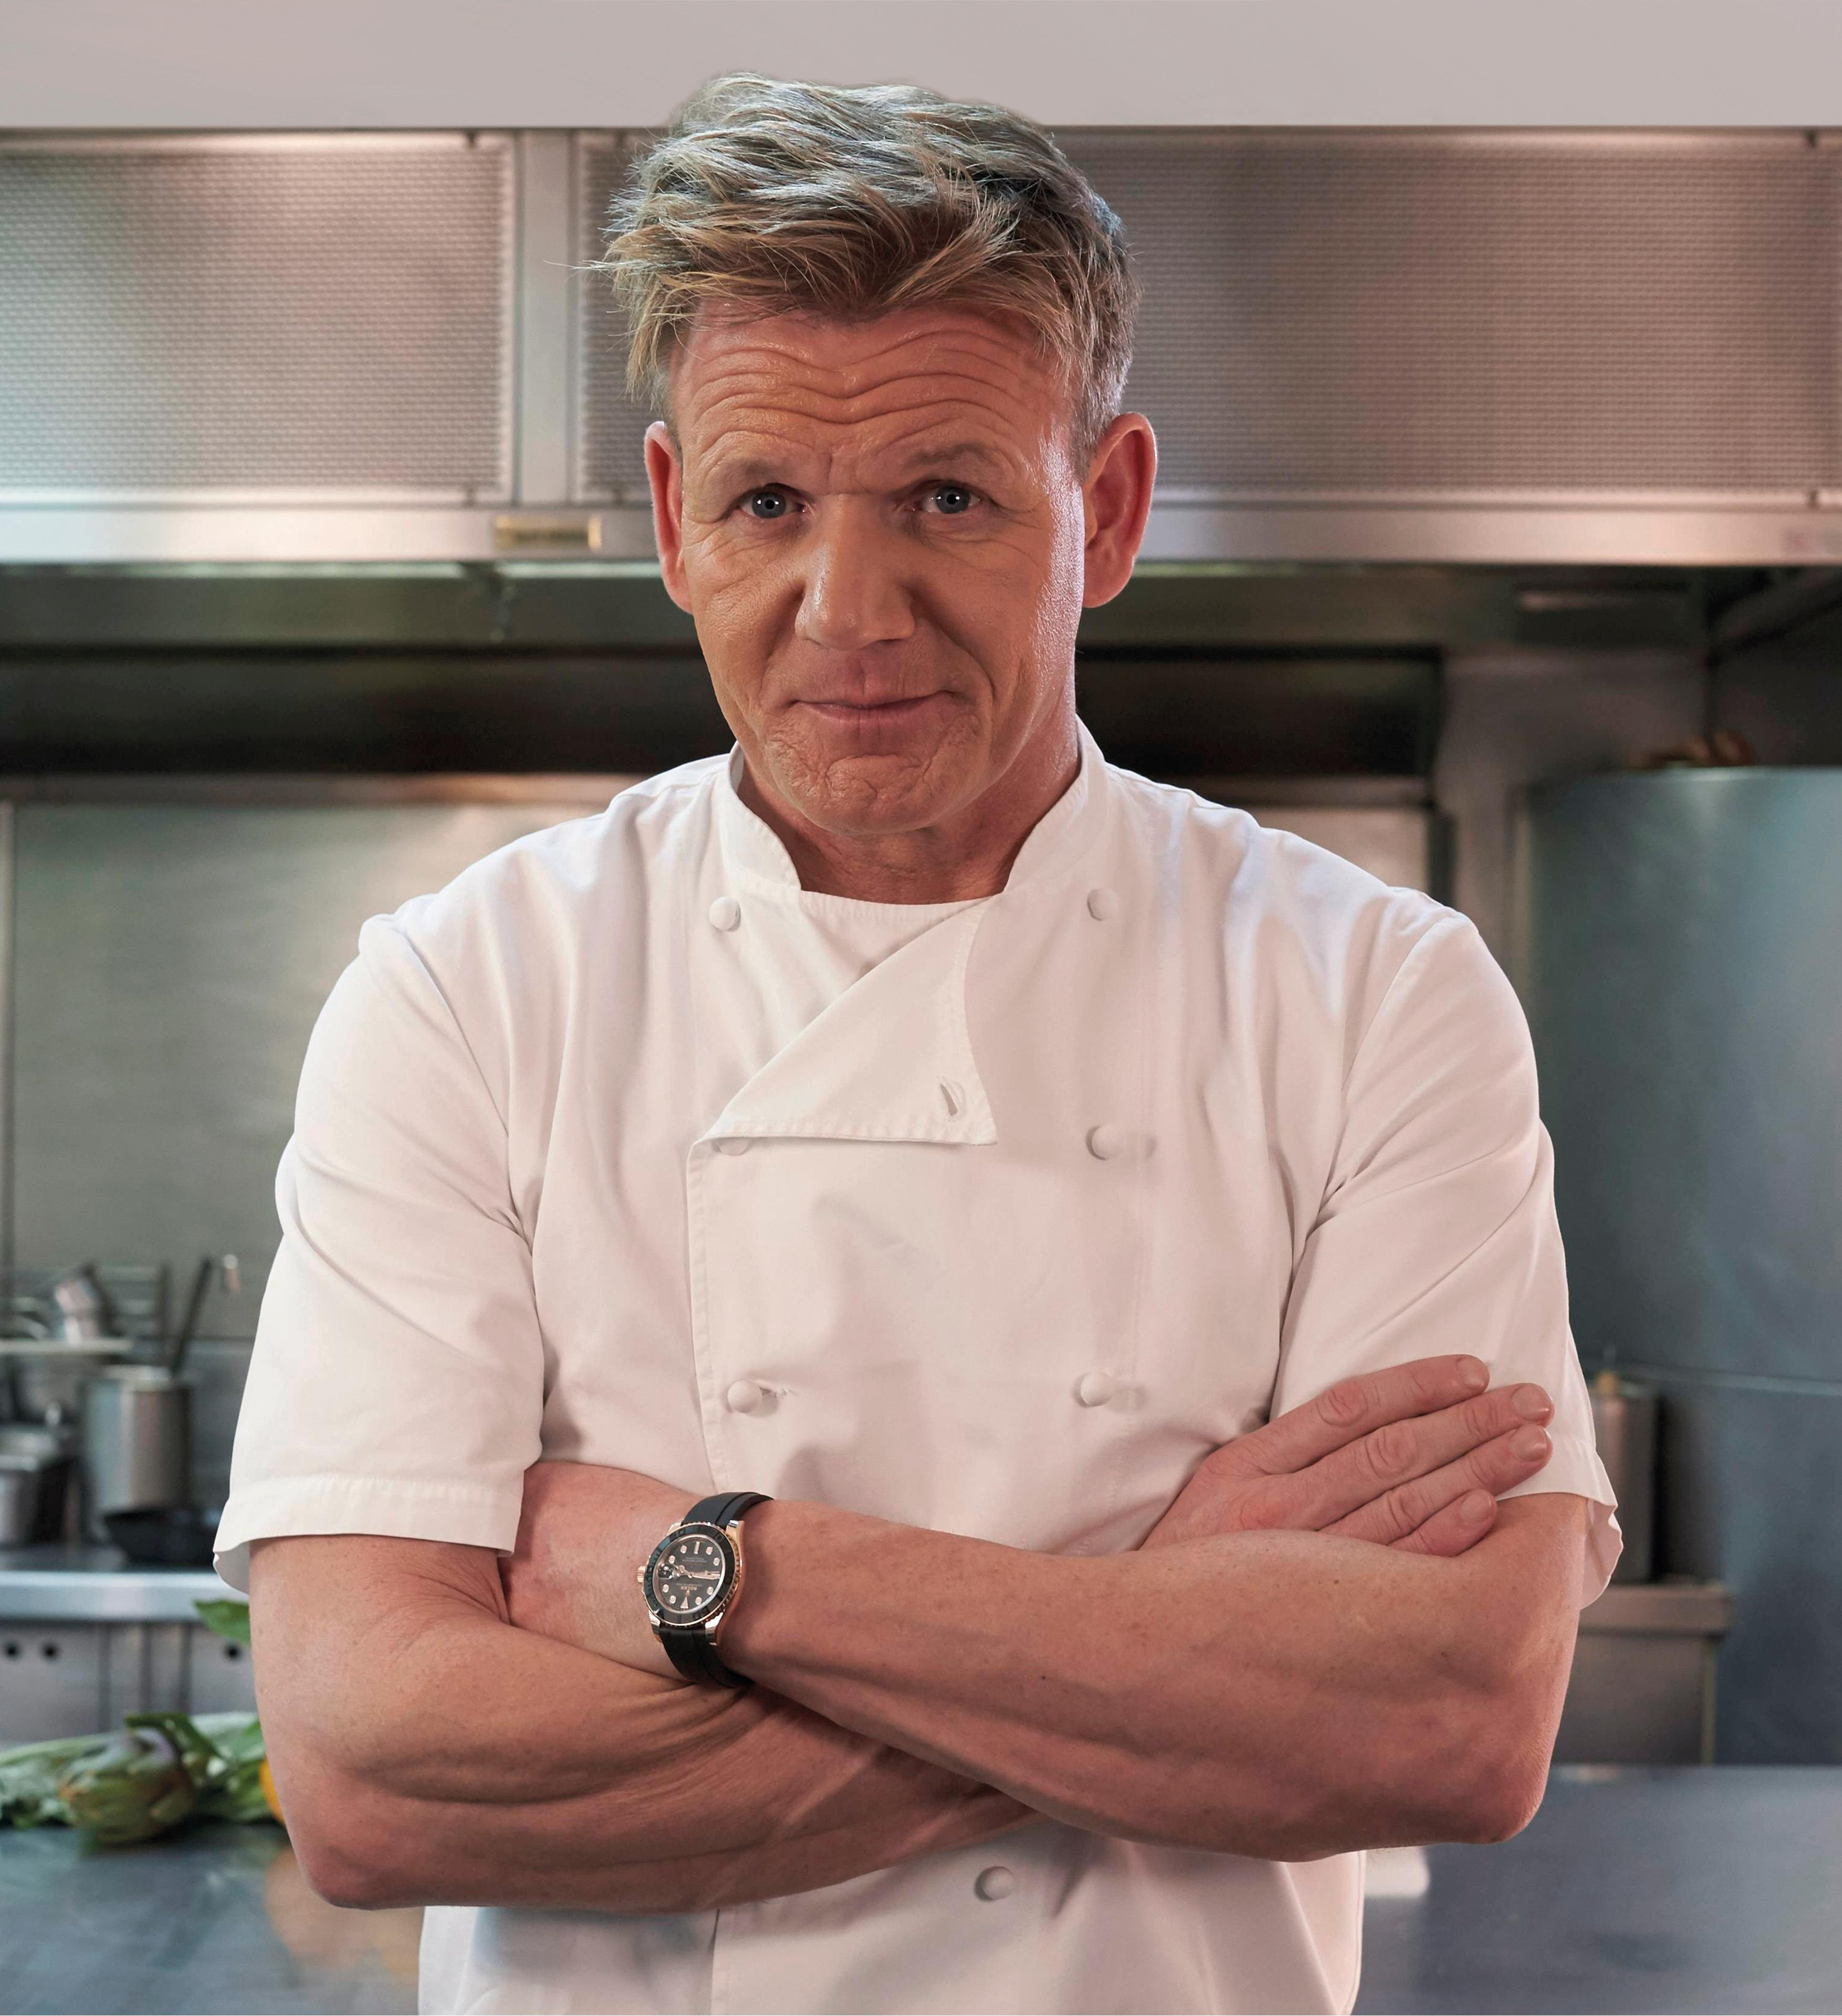 Royal Doulton Gordon Ramsay 6 Piece Knife Block Set, Black